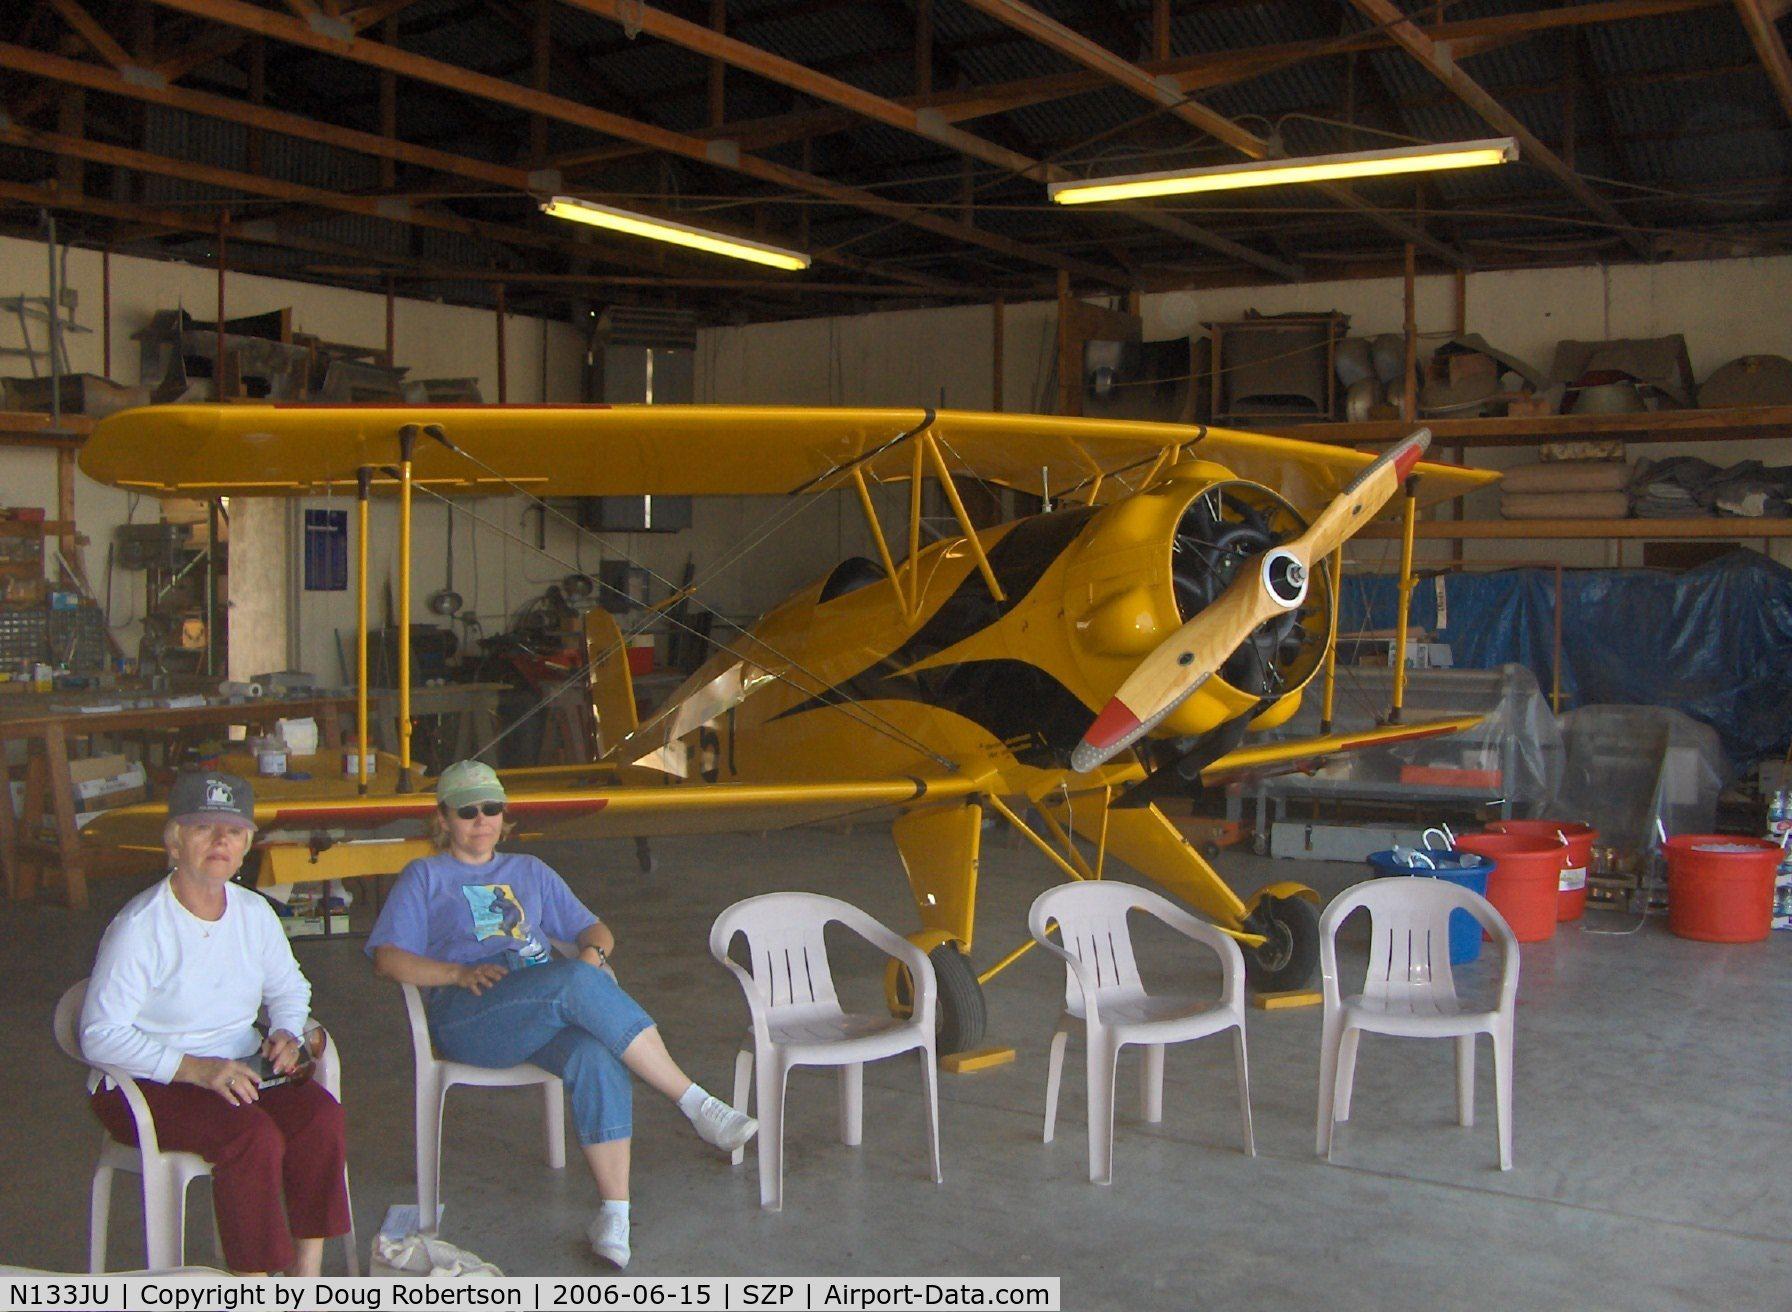 N133JU, 1936 Bucker Bu-133C Jungmeister C/N 1001, 1936 Bucker Jungmeister 133C, Siemens-Halske SH 14-A4 radial 160 Hp, in Krybus host hangar, Bucker Fly-In